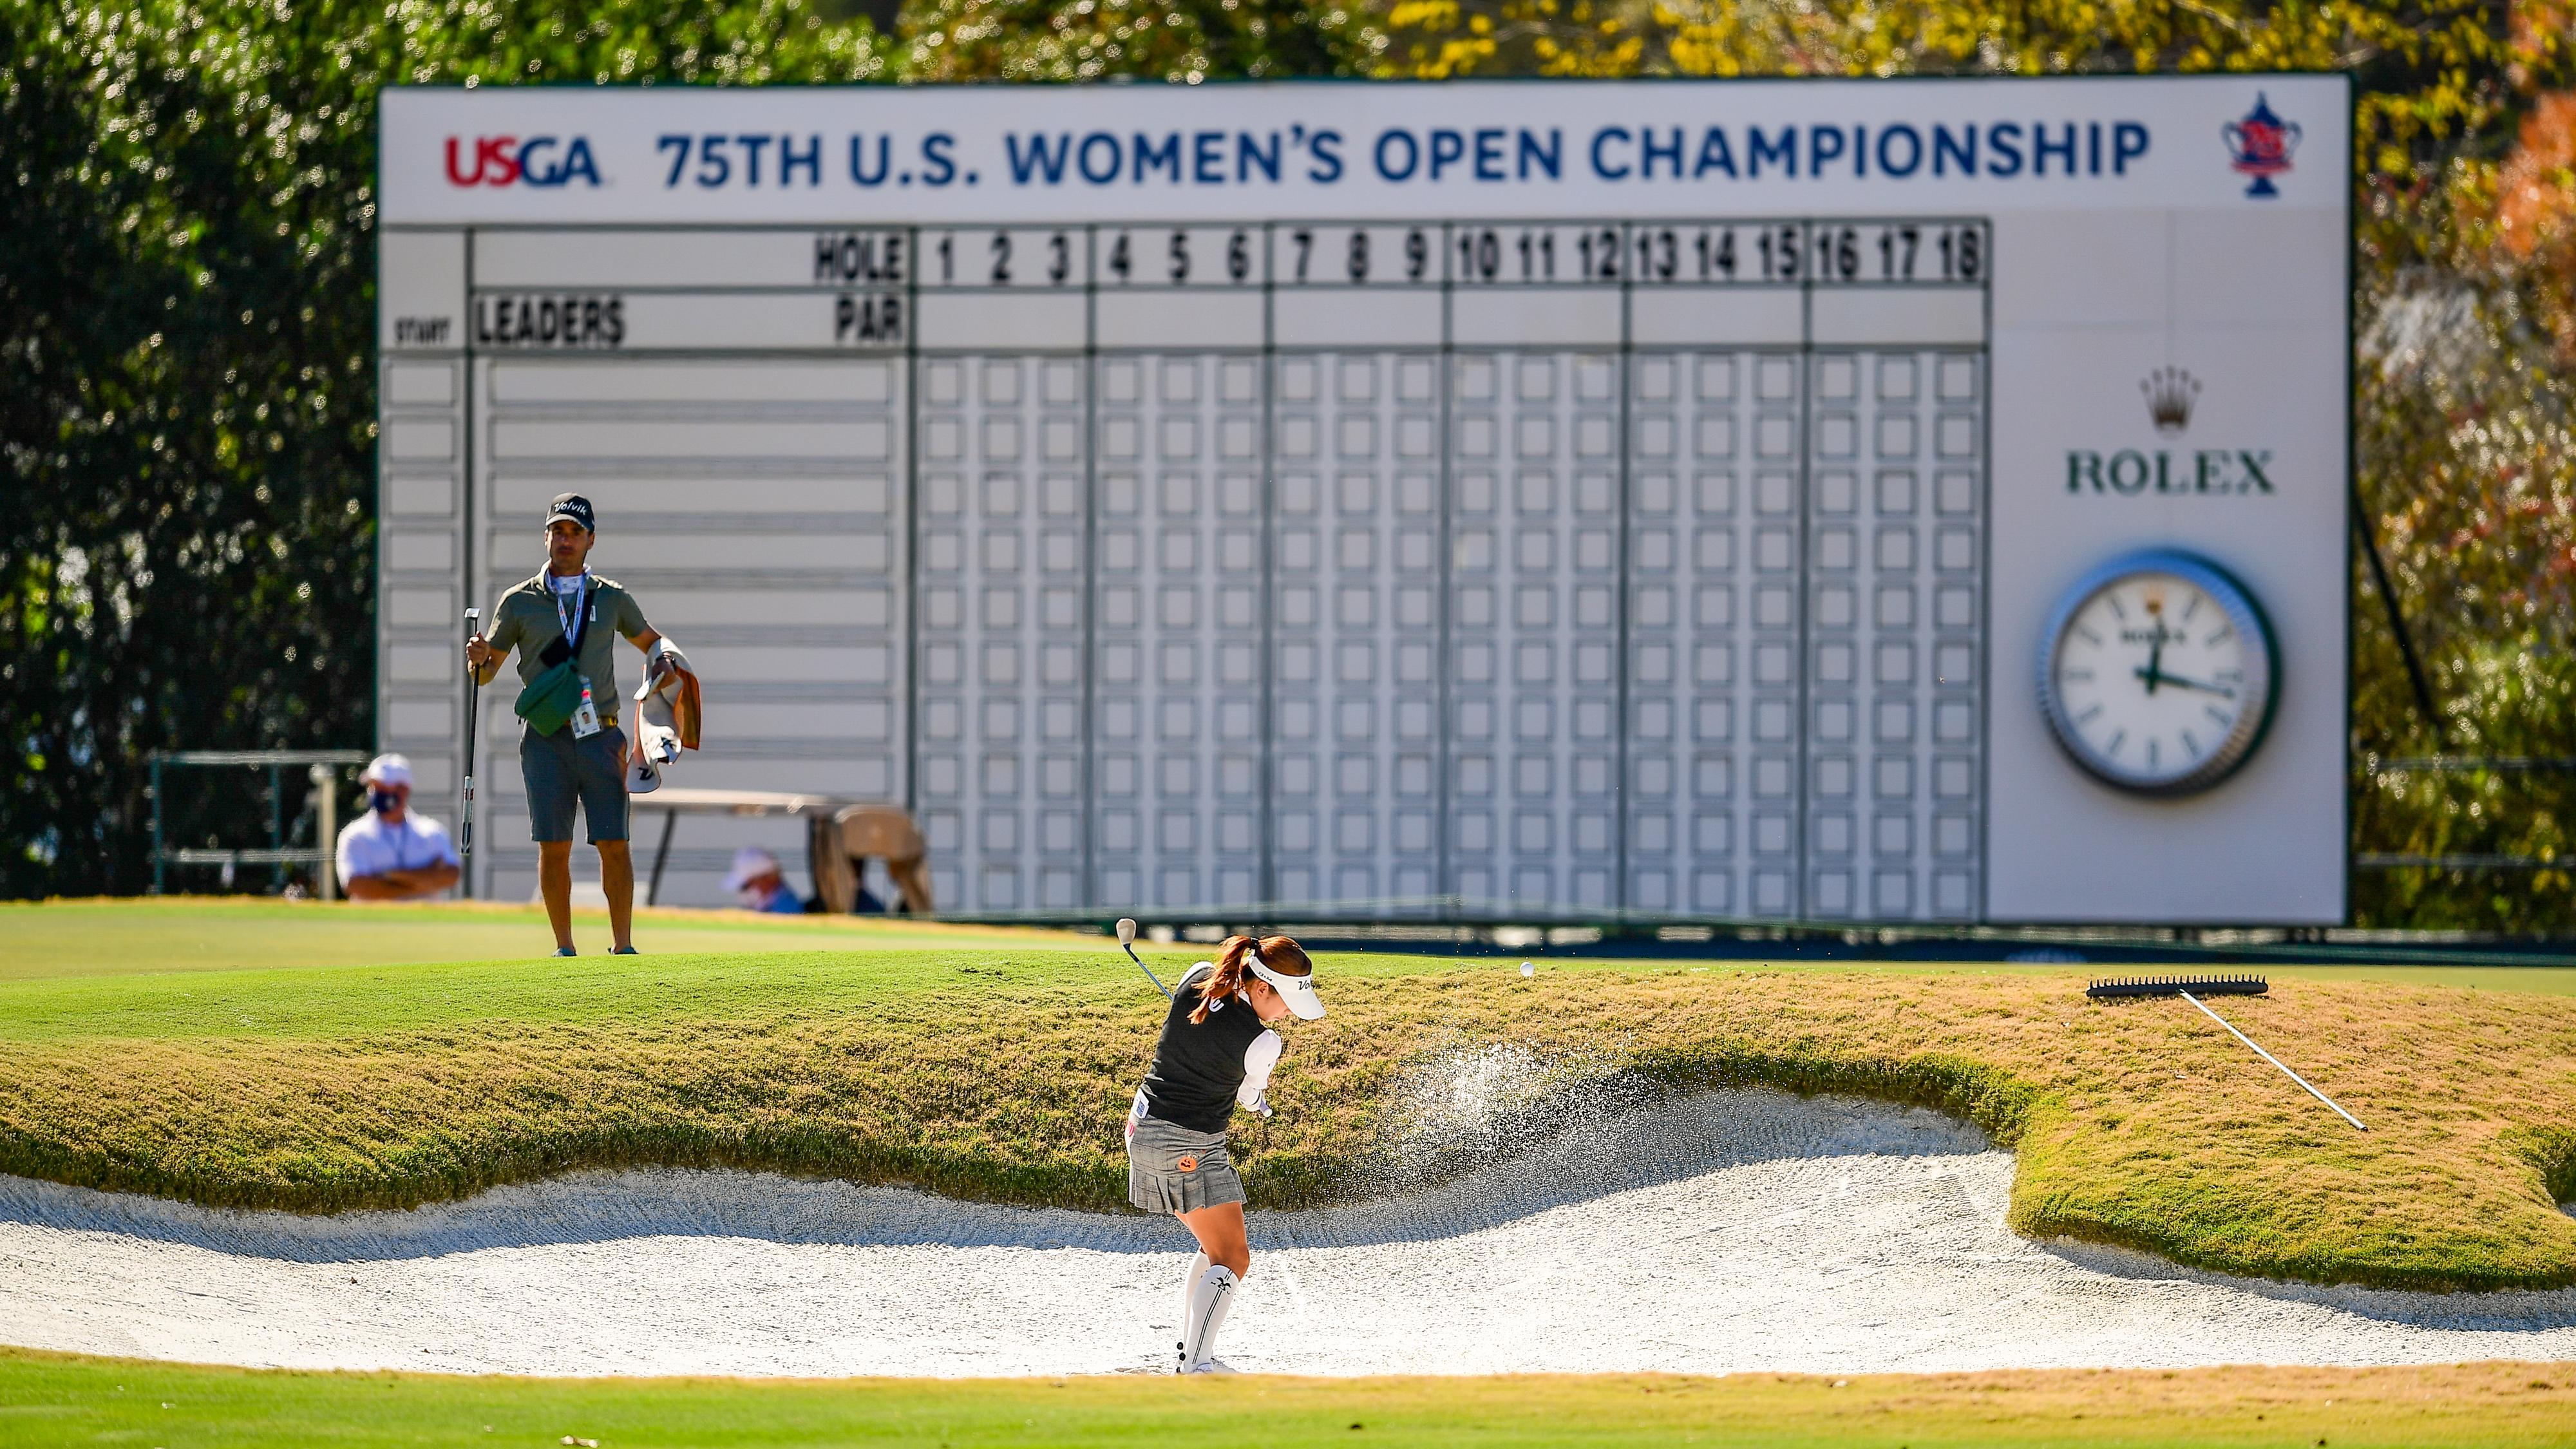 http://res.cloudinary.com/usga/image/upload/v1/usga/images/championships/2020/womens-open/galleries/wednesday-practice-round/20USWO_1209_RB1_1004.jpg